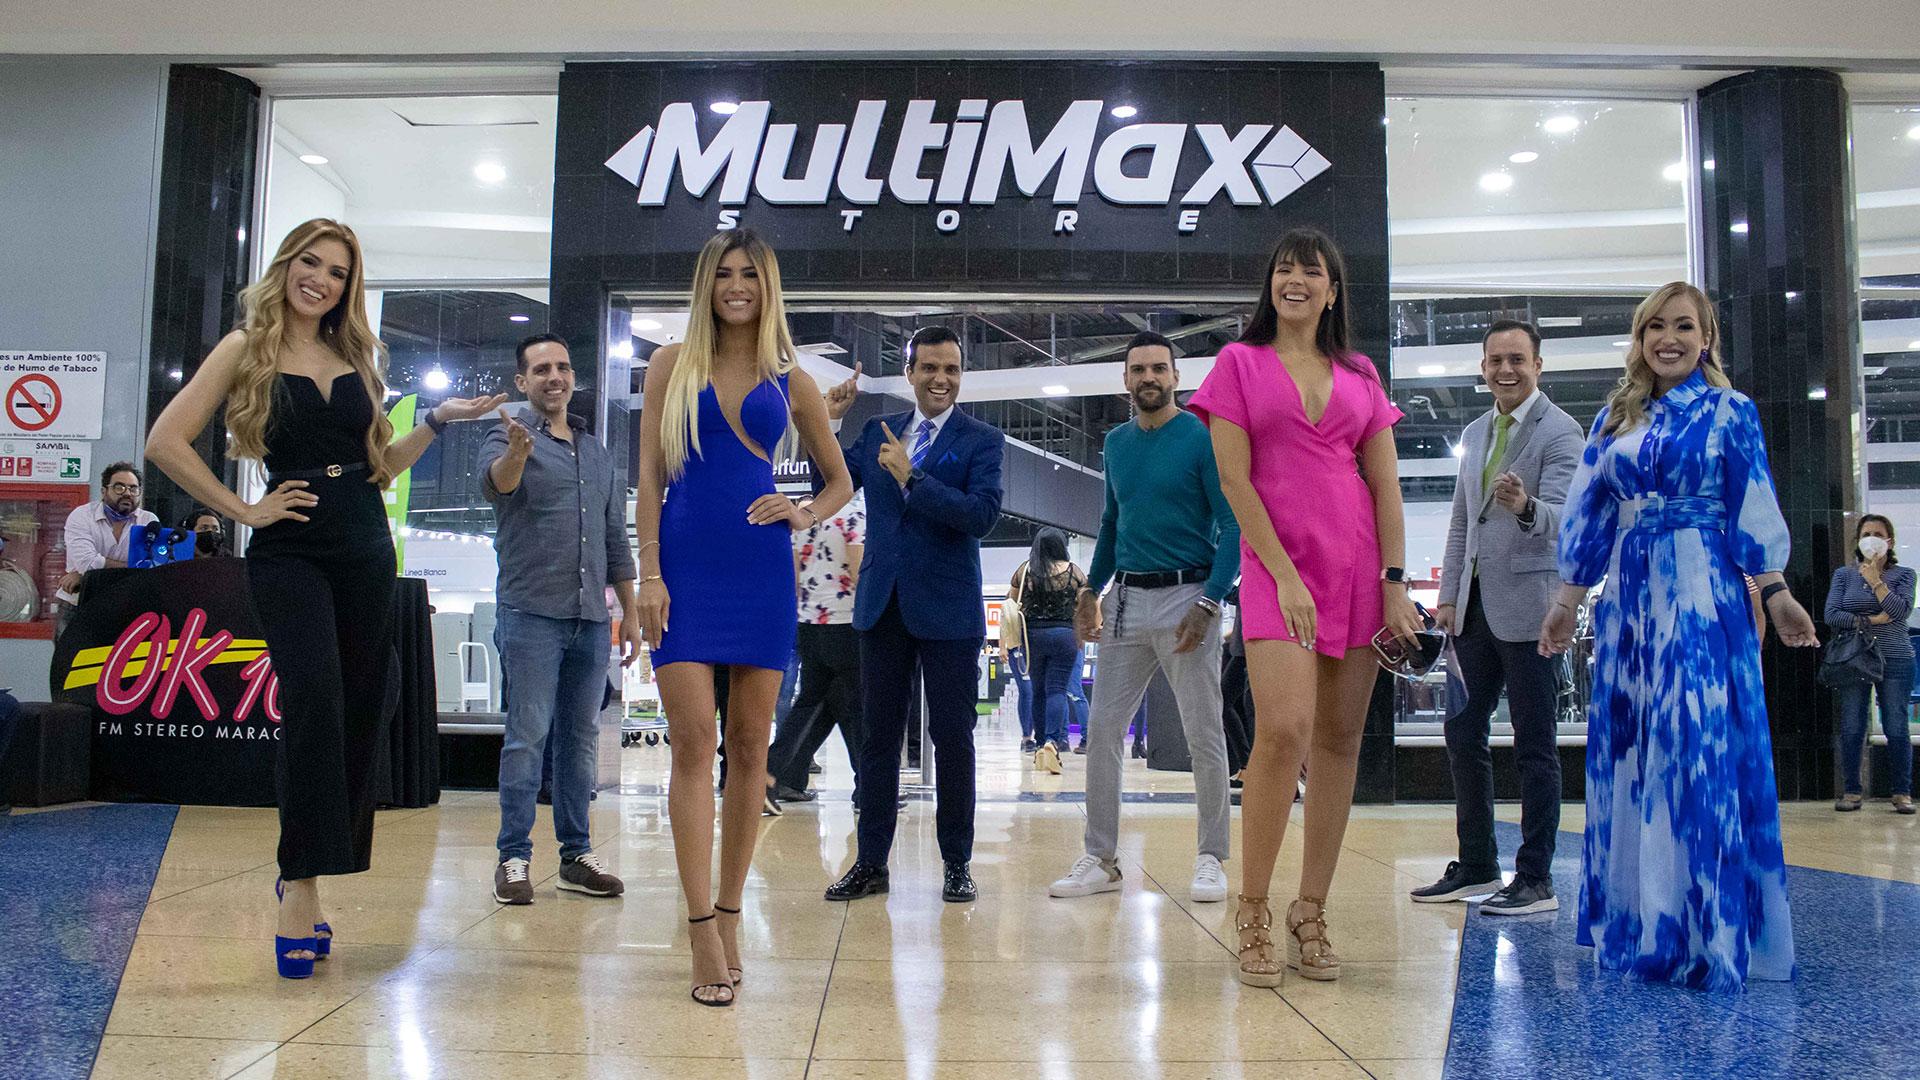 multimax maracaibo 4